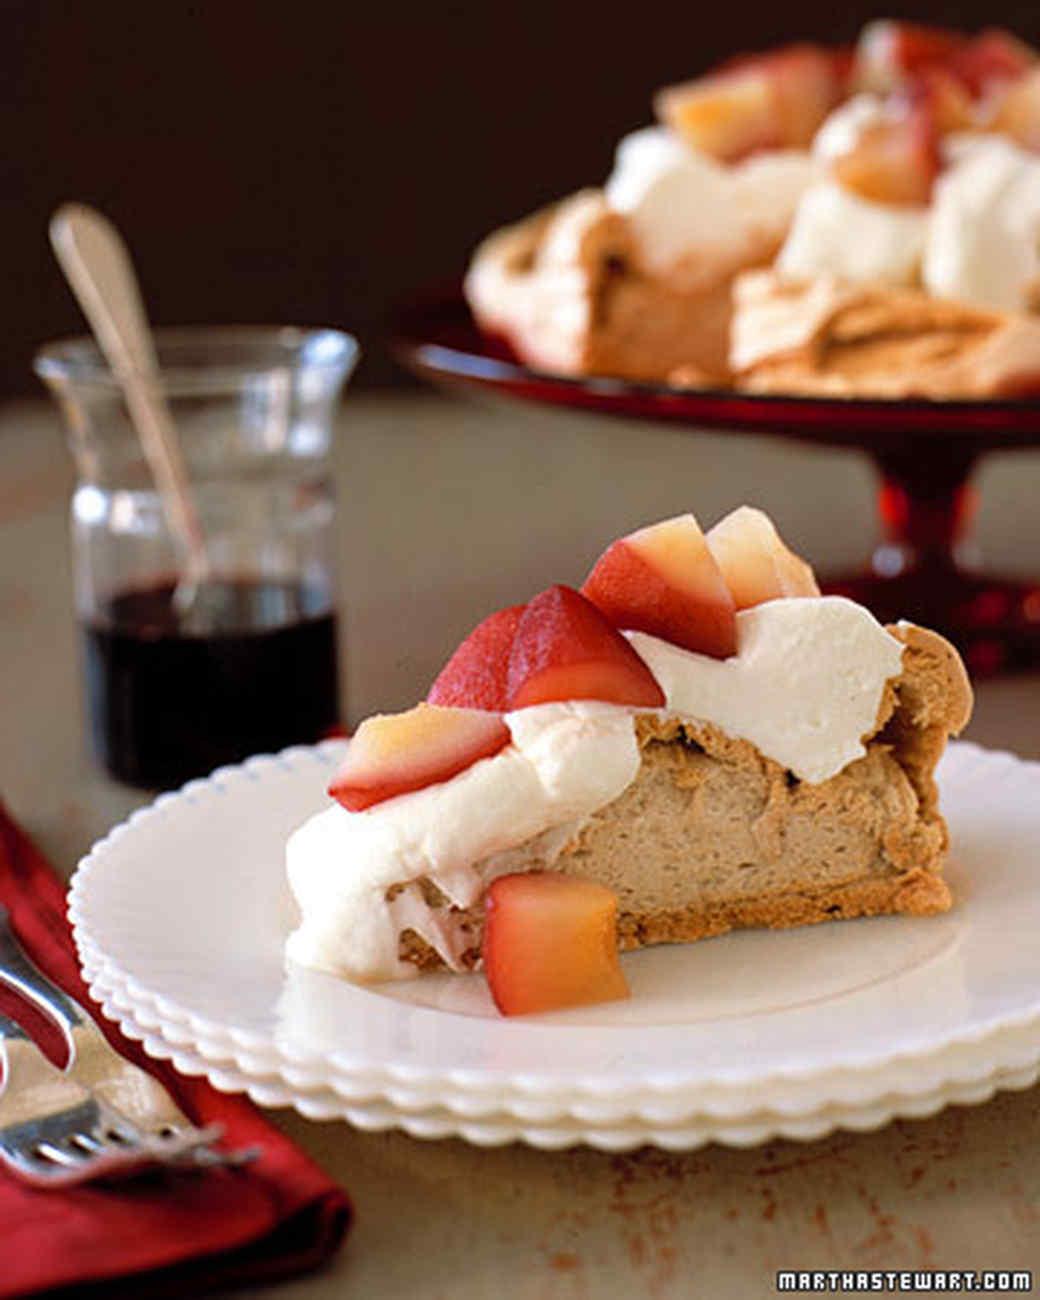 Our Food Editors' Favorite Thanksgiving Dessert Recipes